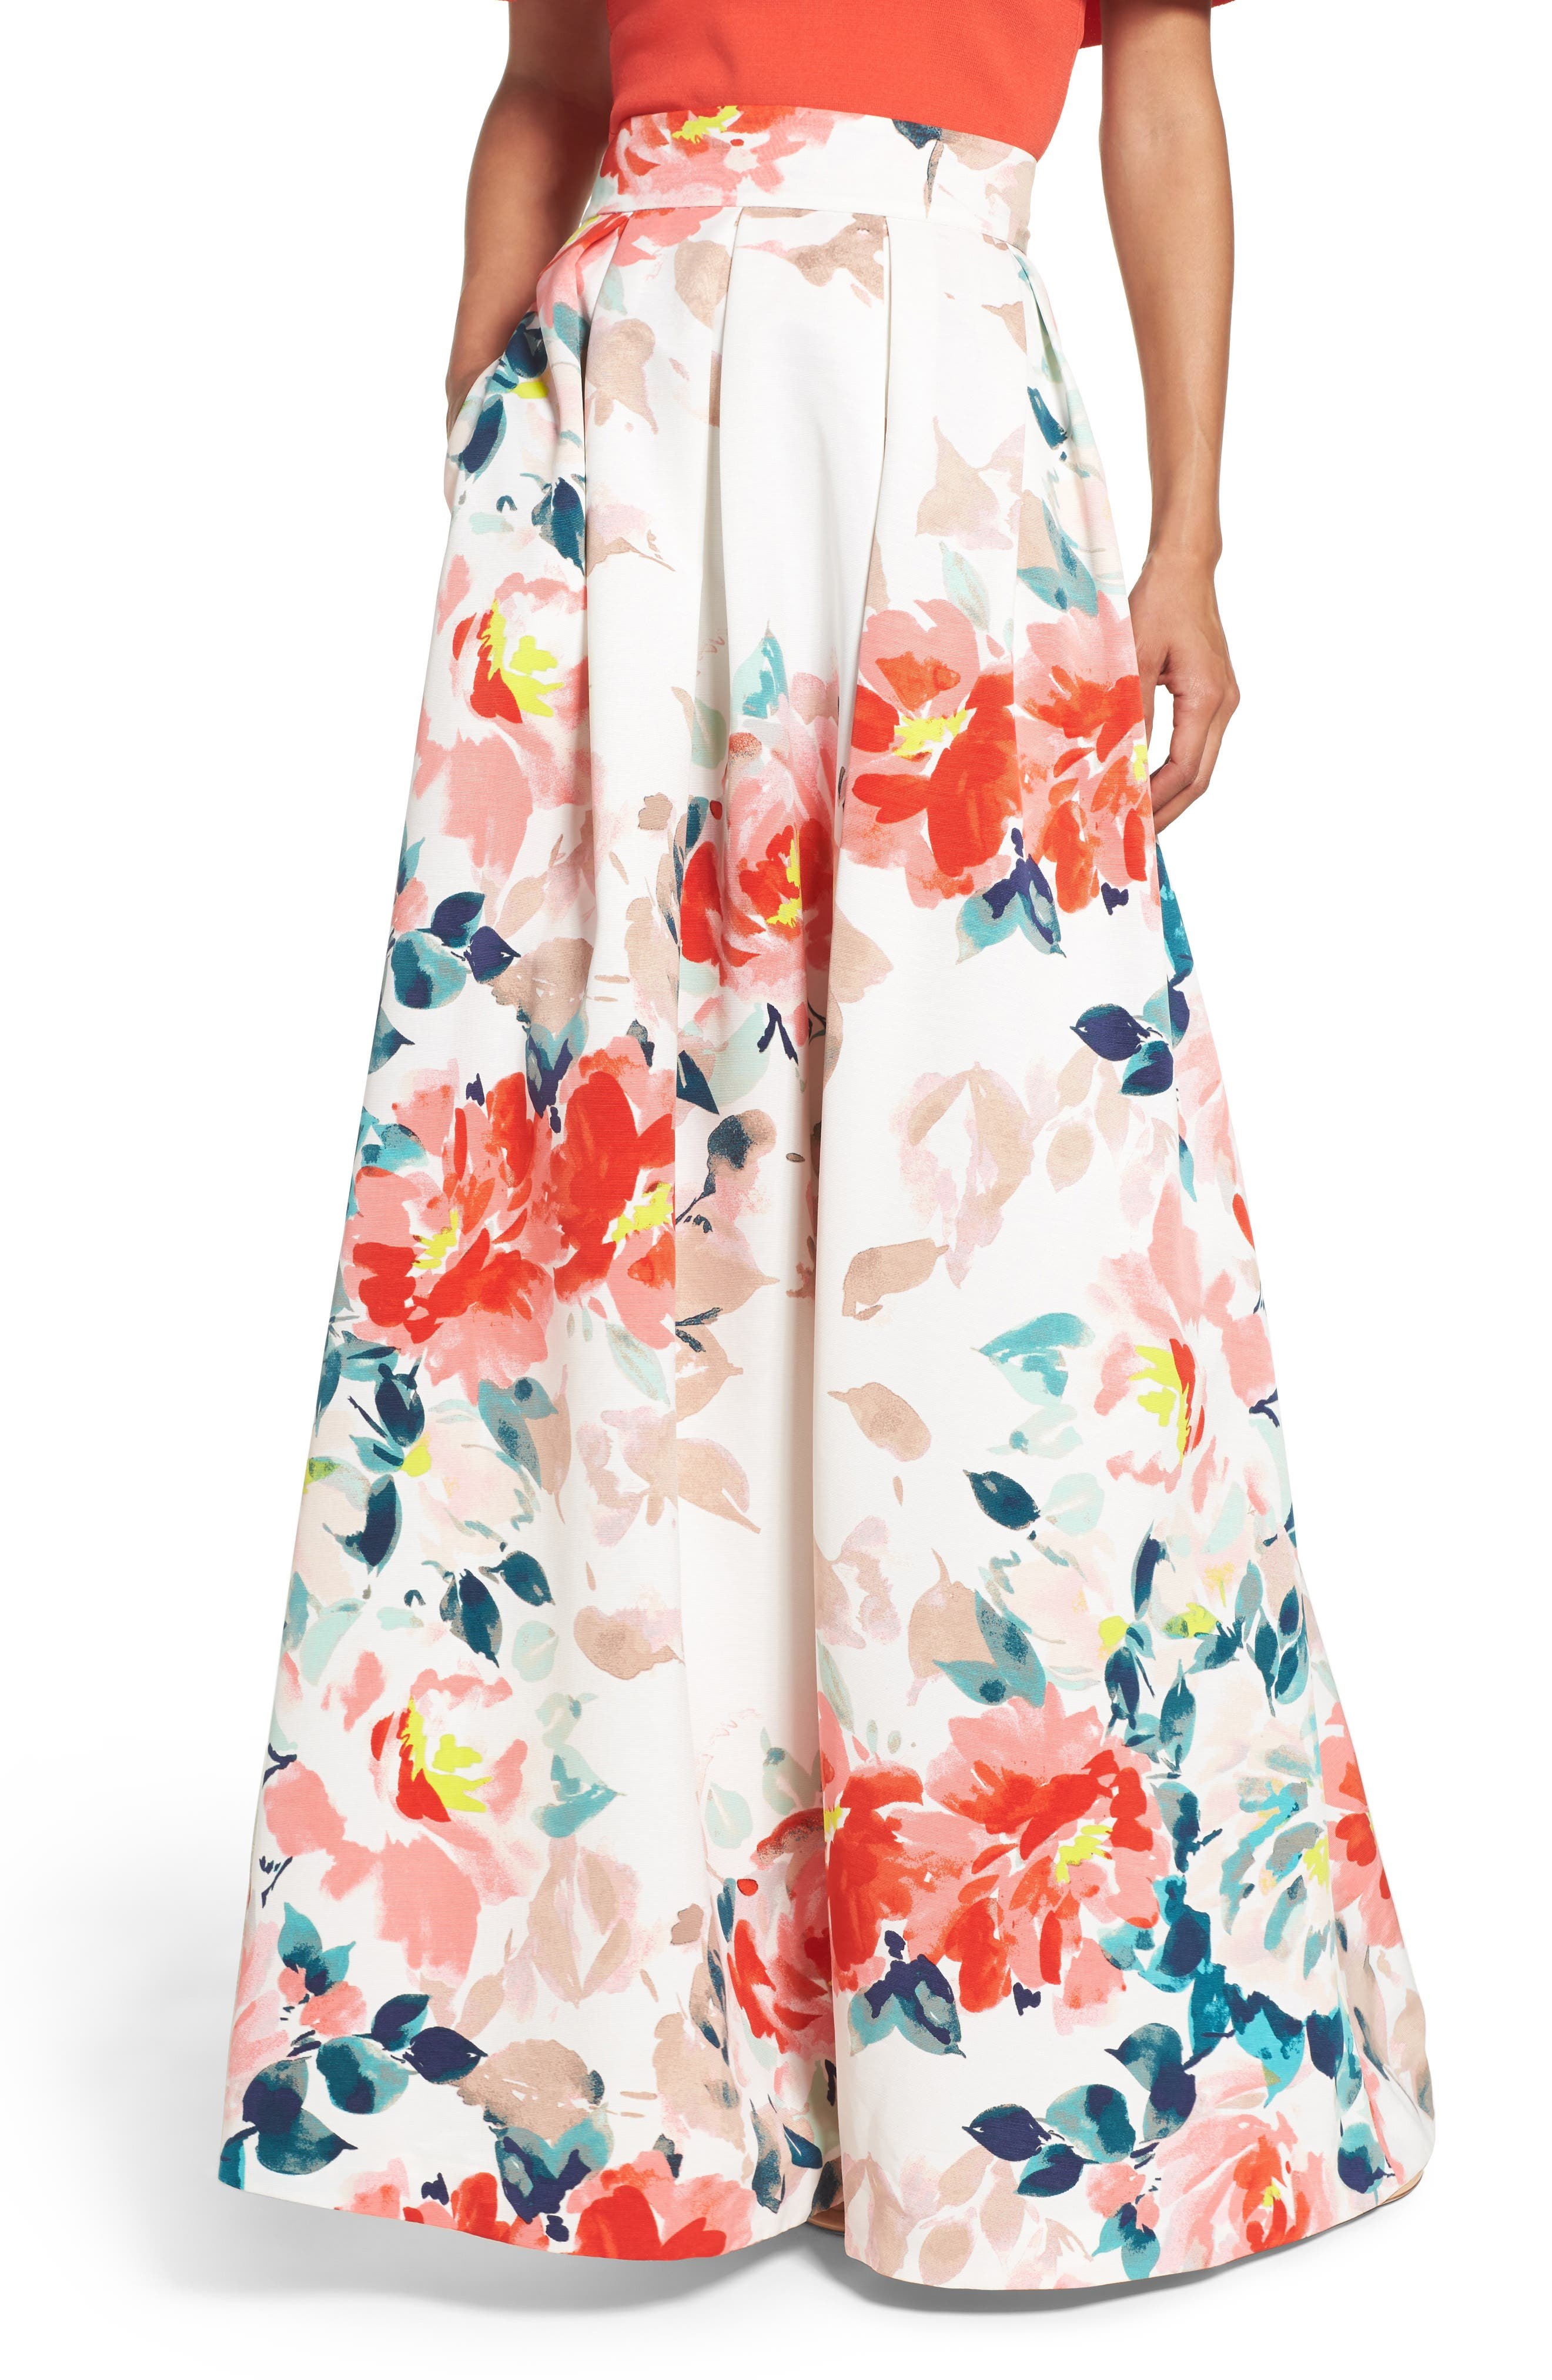 Faille Ball Skirt,                         Main,                         color, Ivory/ Orange